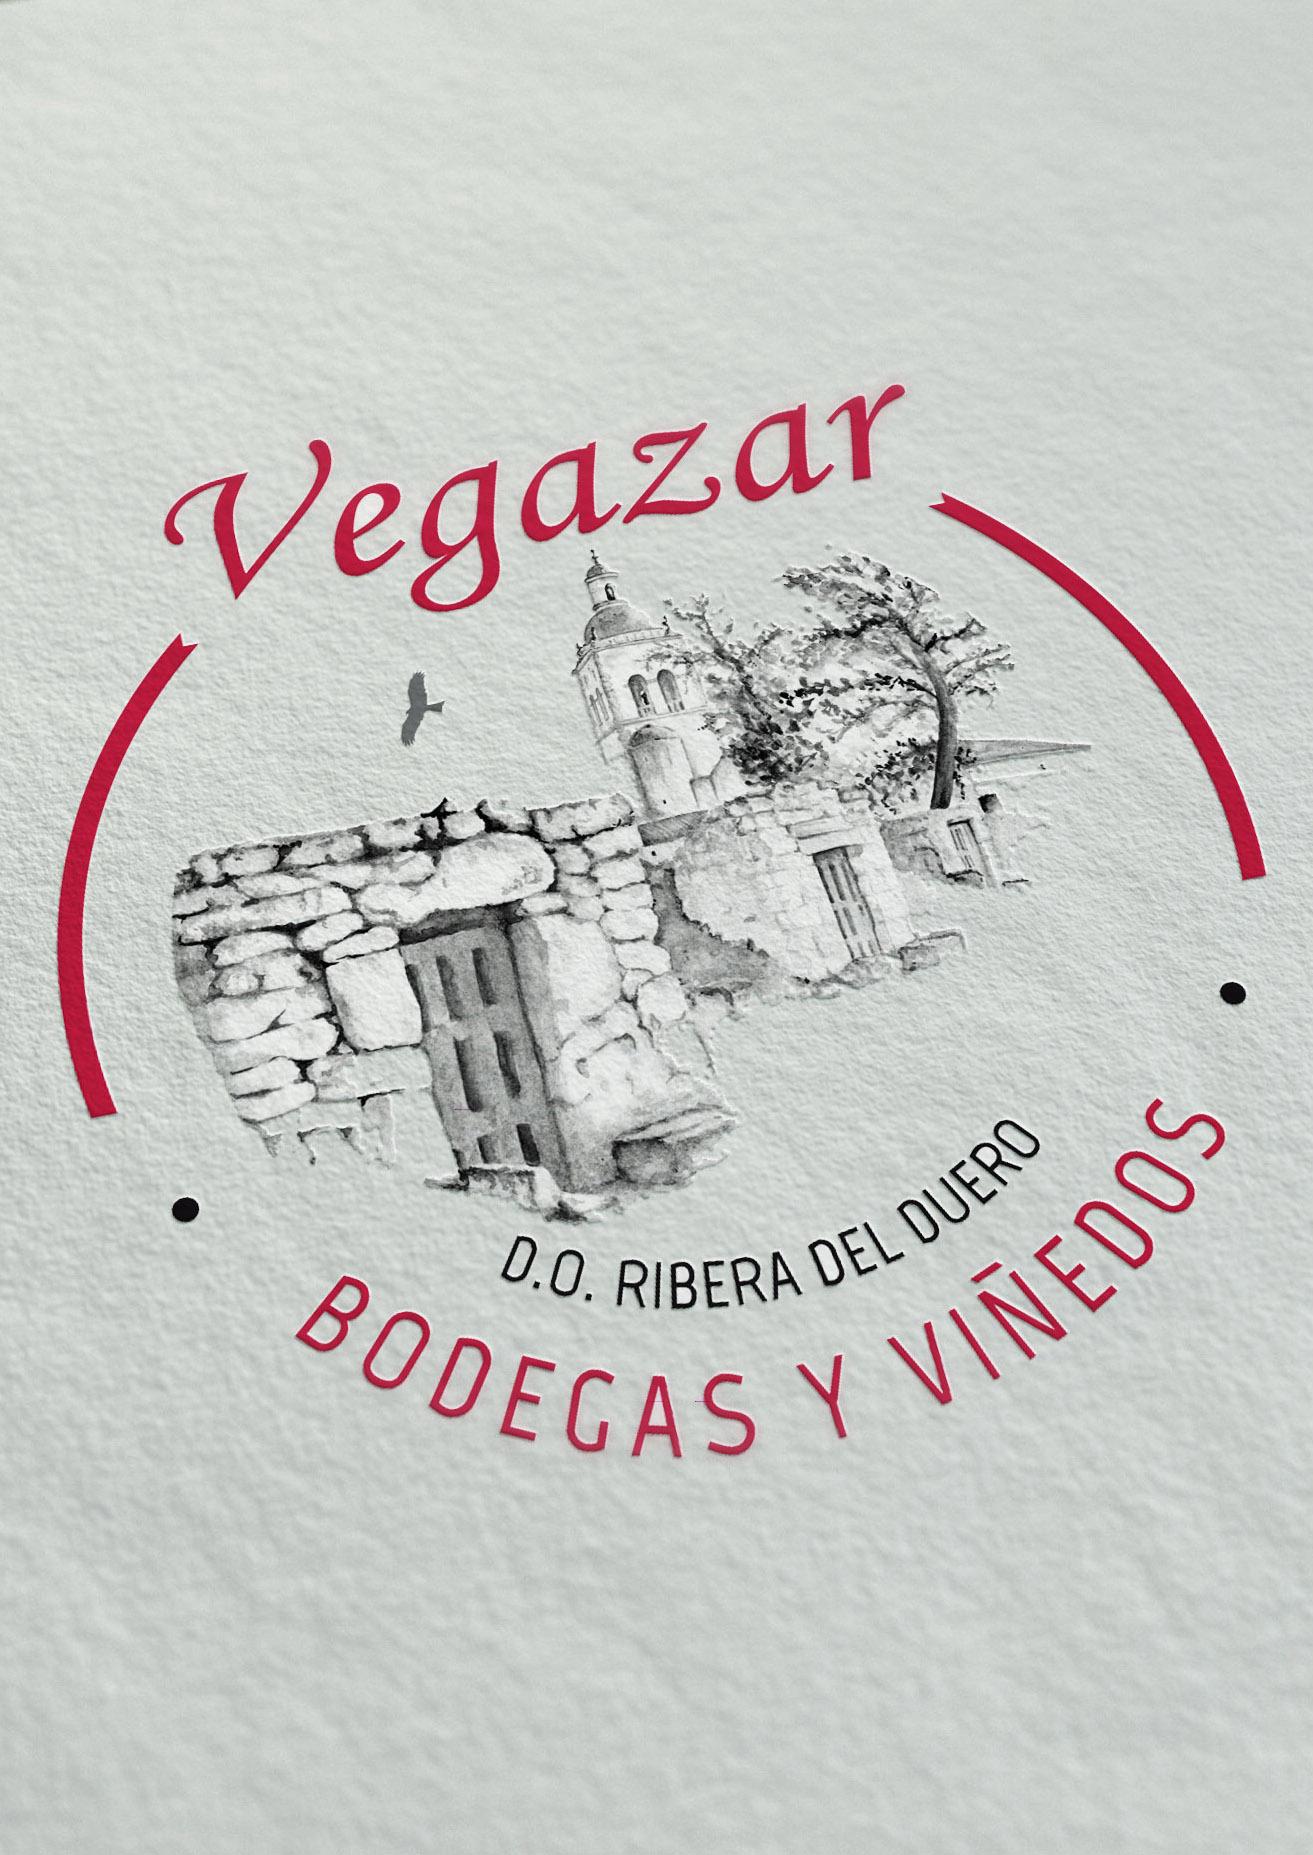 Vegazar - Imagen corporativa